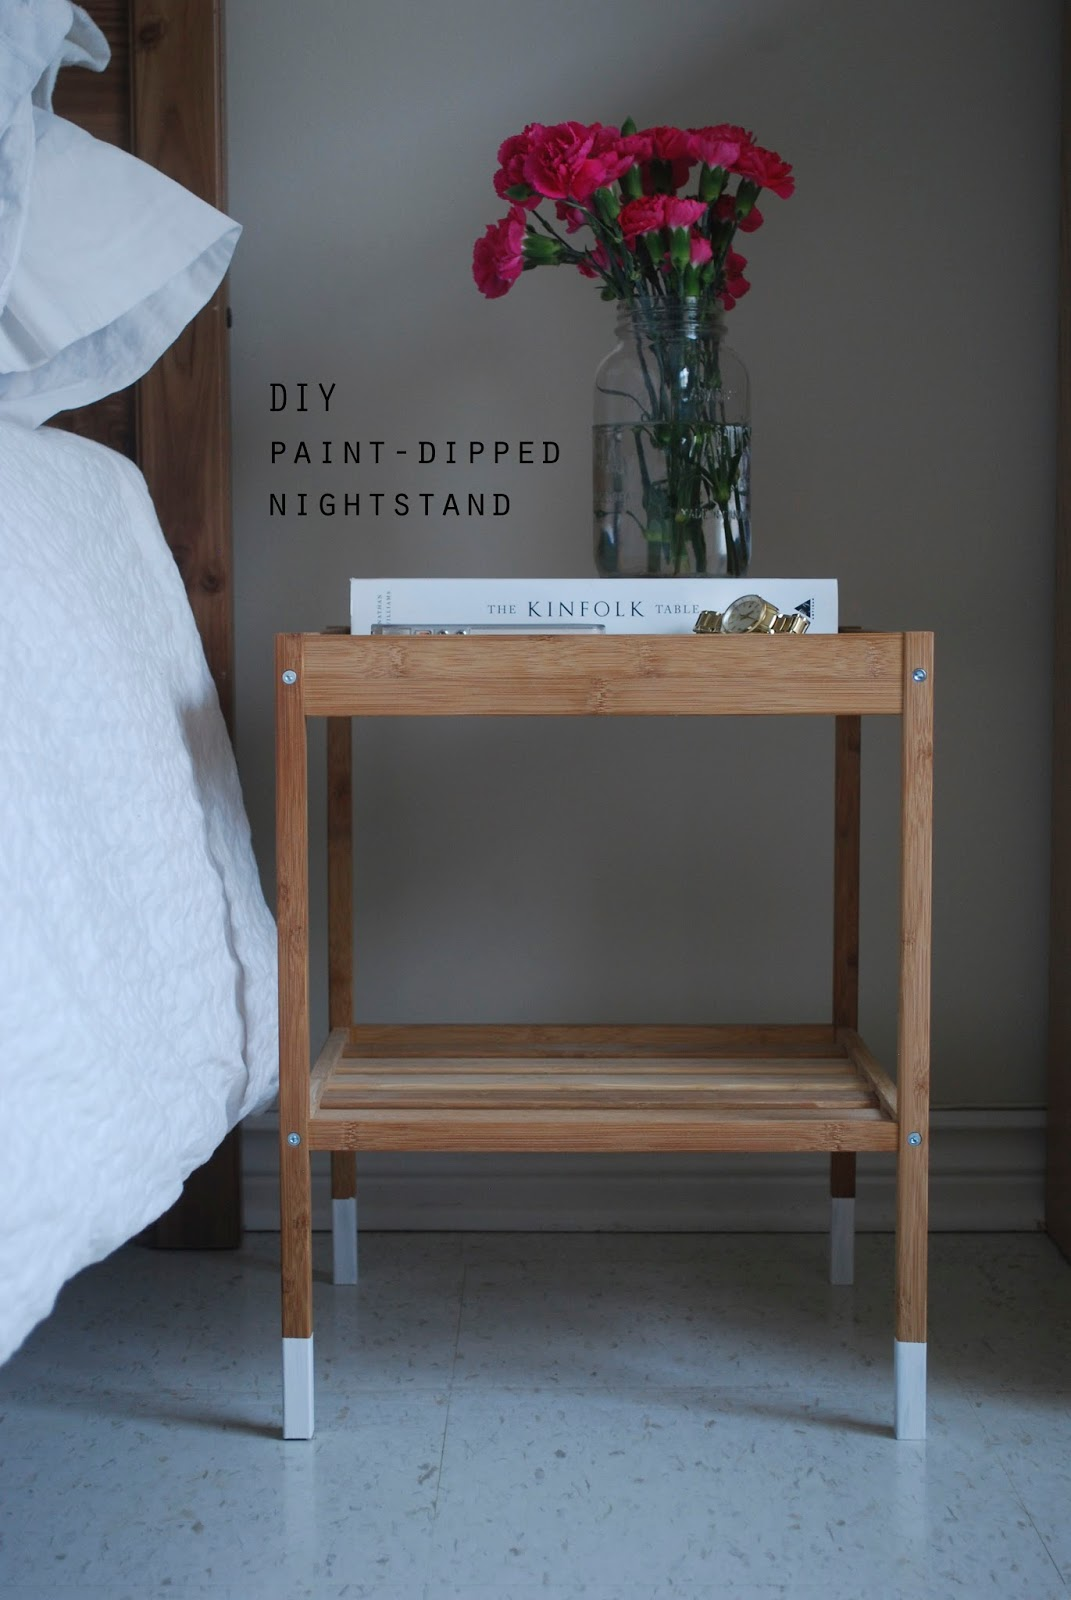 Design Diy Nightstand diy paint dipped nightstand what emily said nightstand